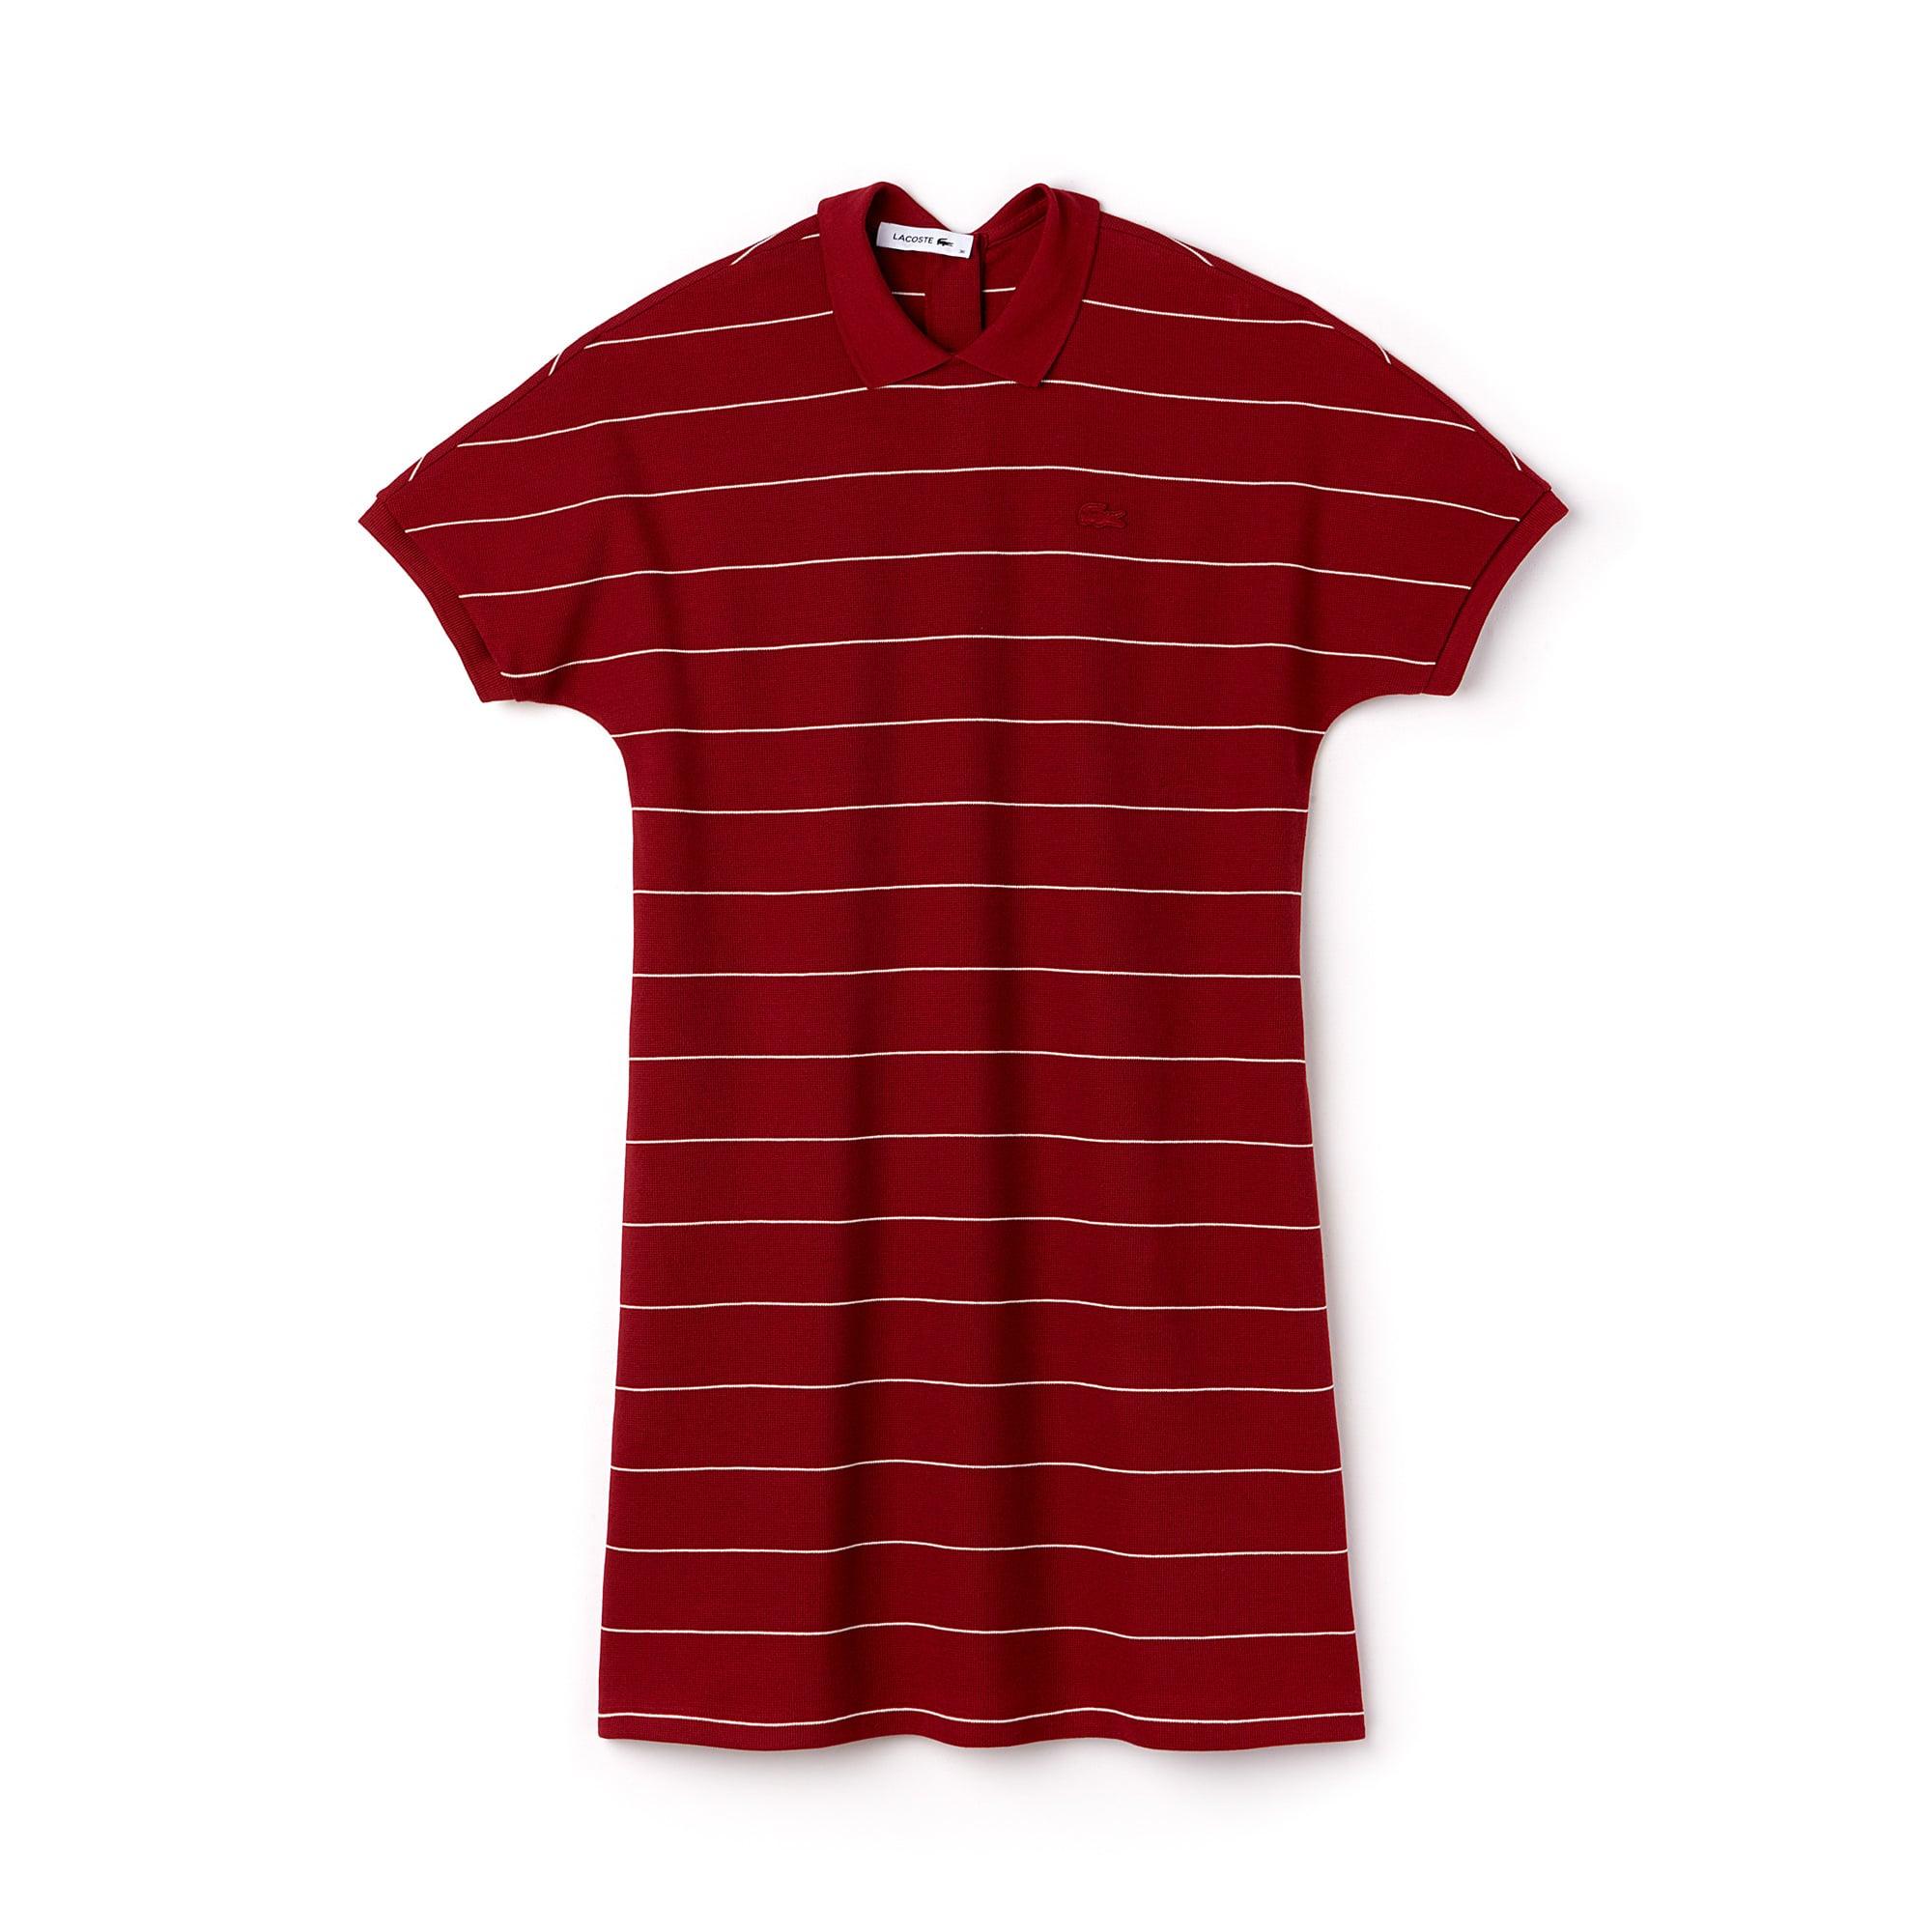 Women's Striped Honeycomb Cotton Polo Dress